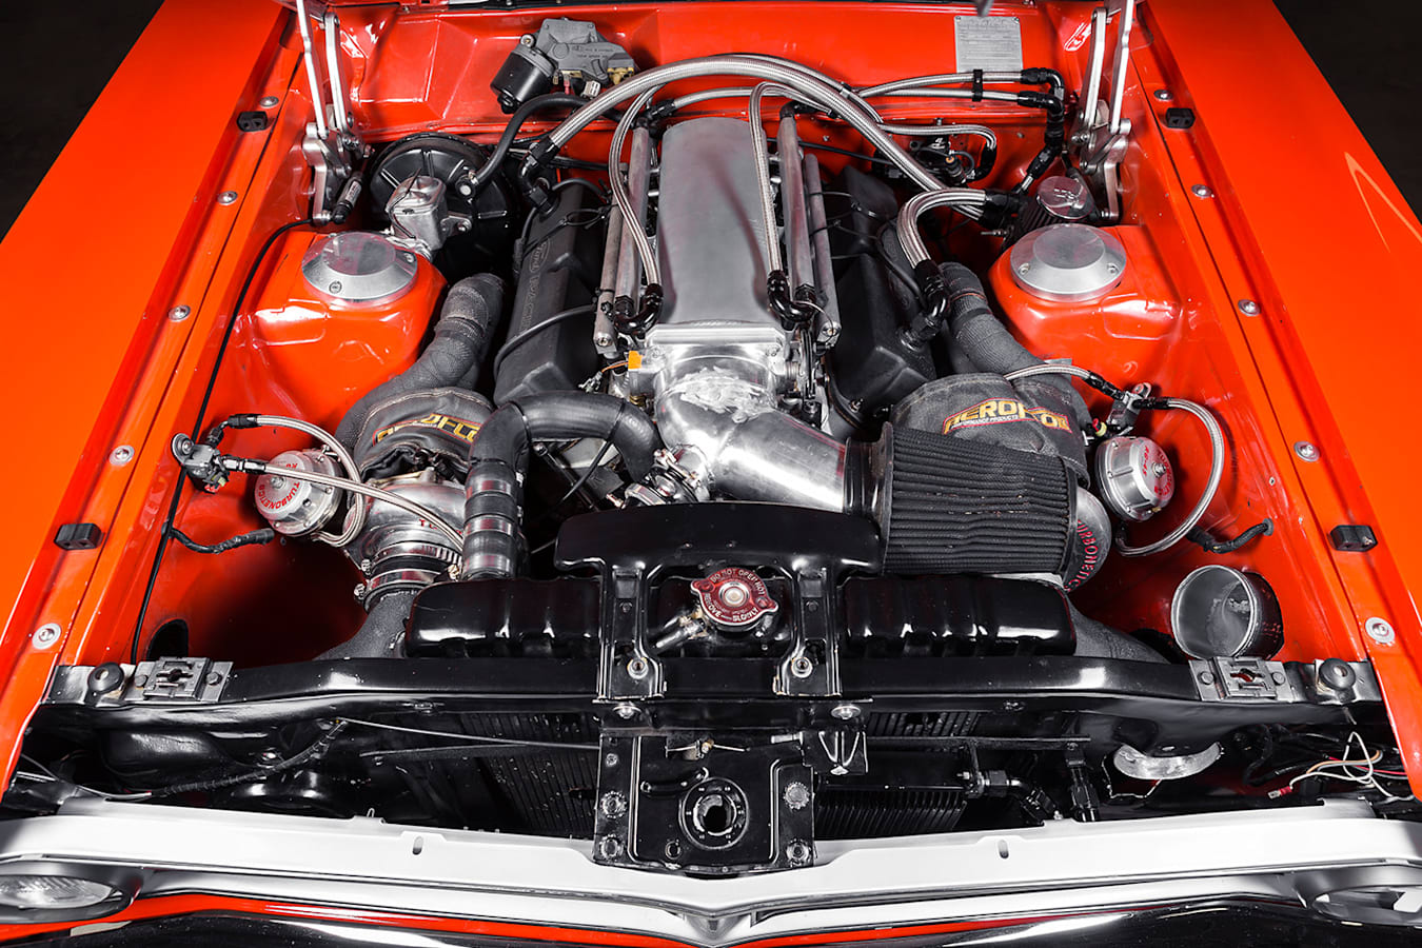 Ford Falcon XW ute engine bay